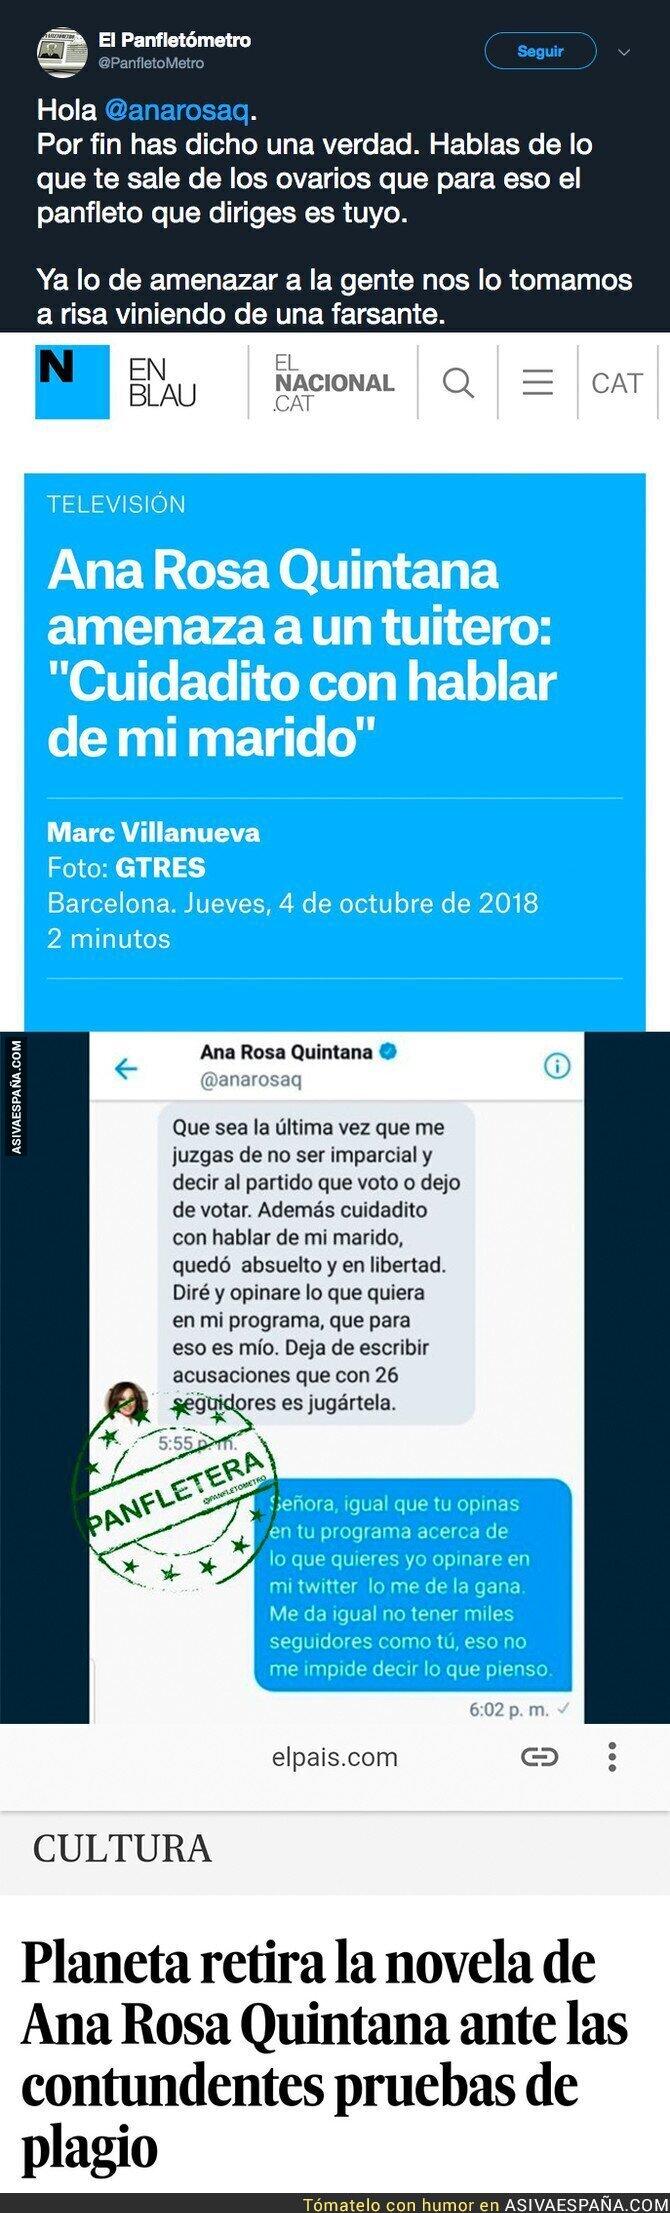 94318 - Las amenazas de Ana Rosa Quintana